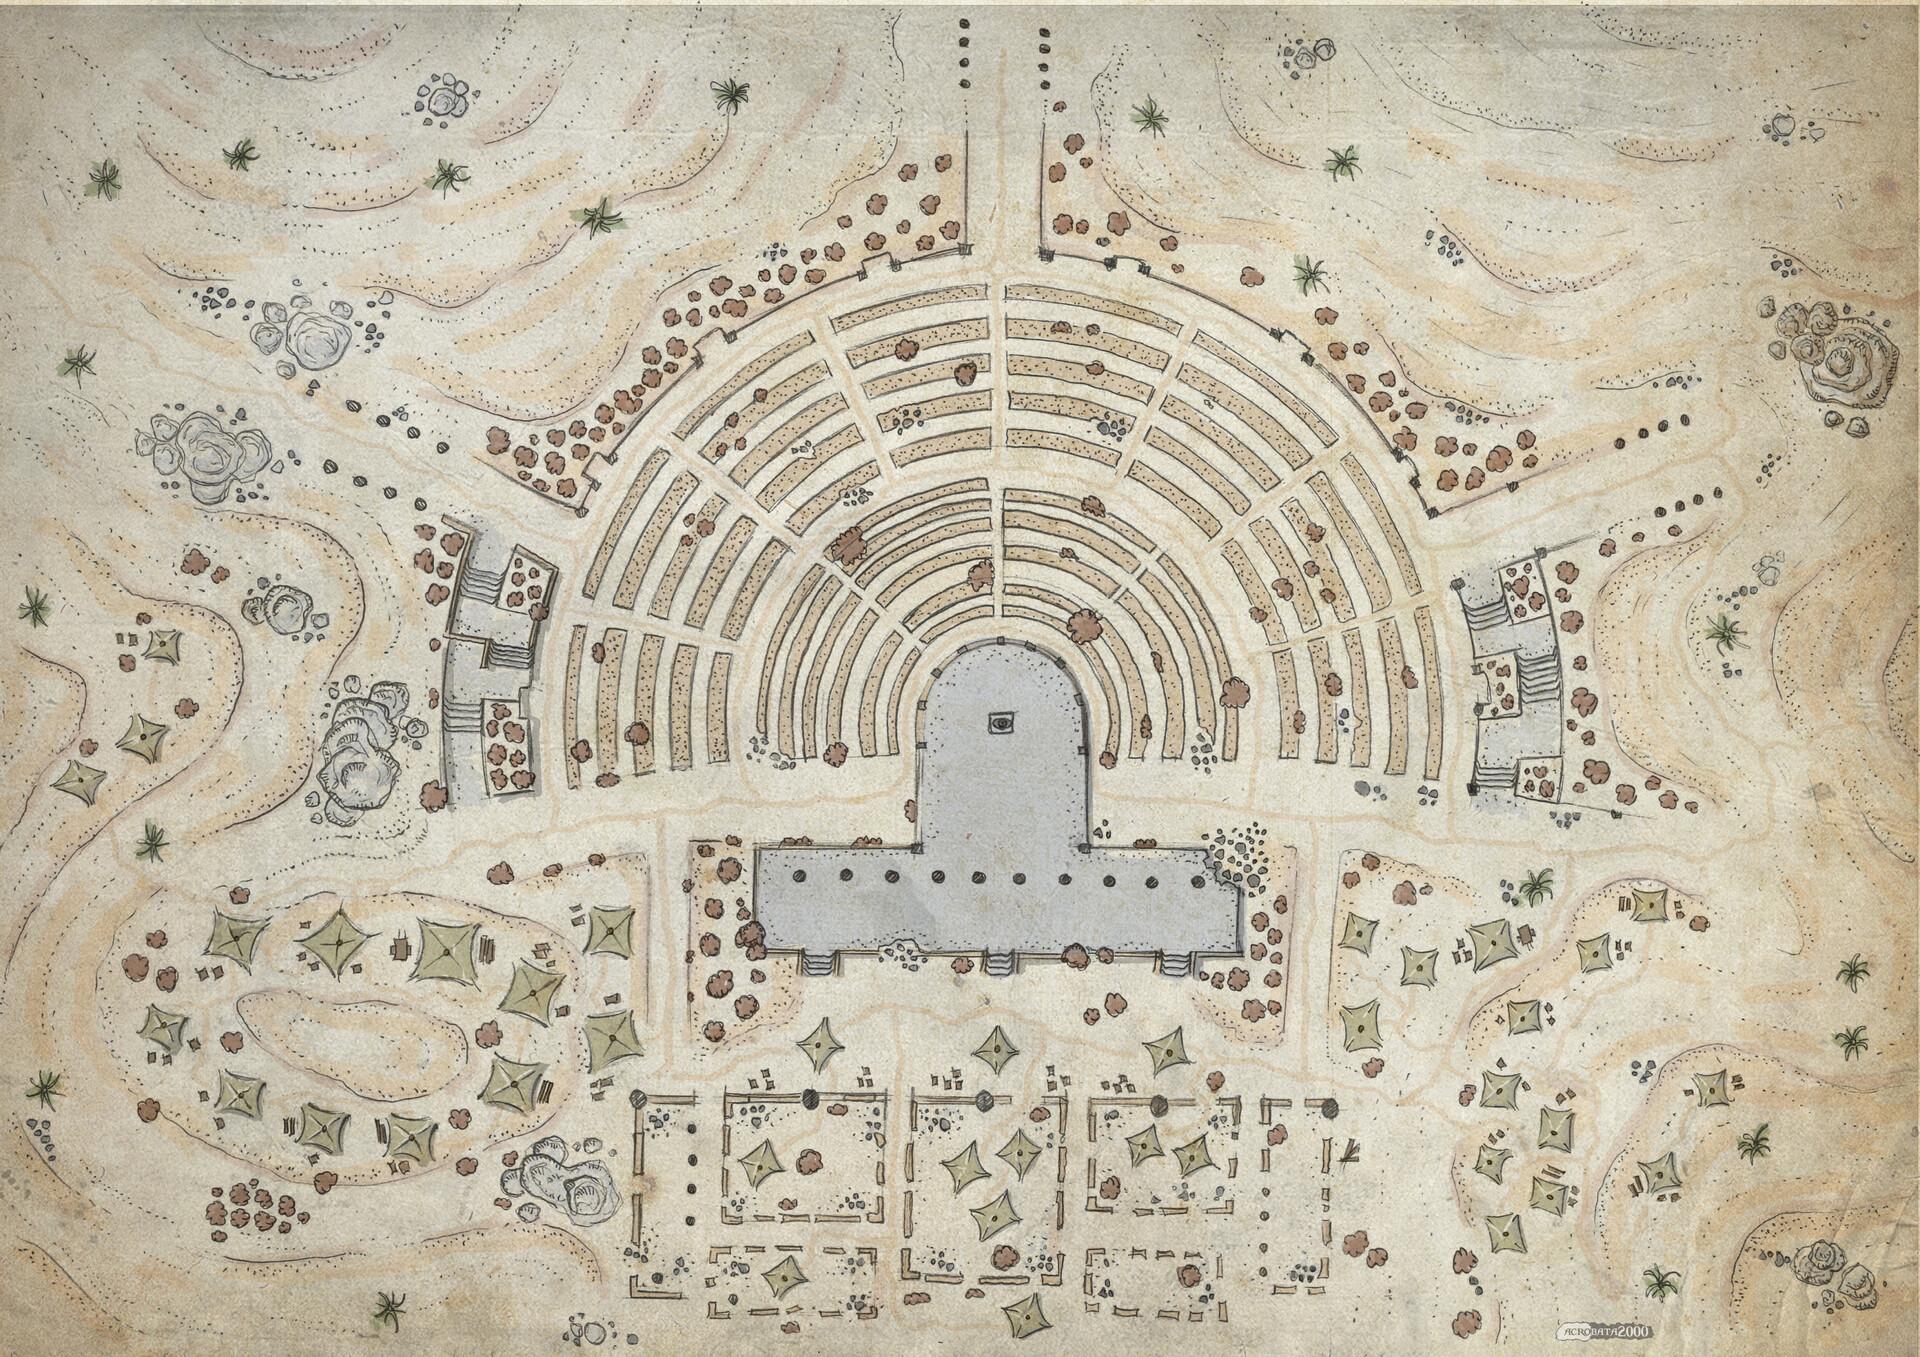 Acrobata2000 dosmil ruinas badr al mosak